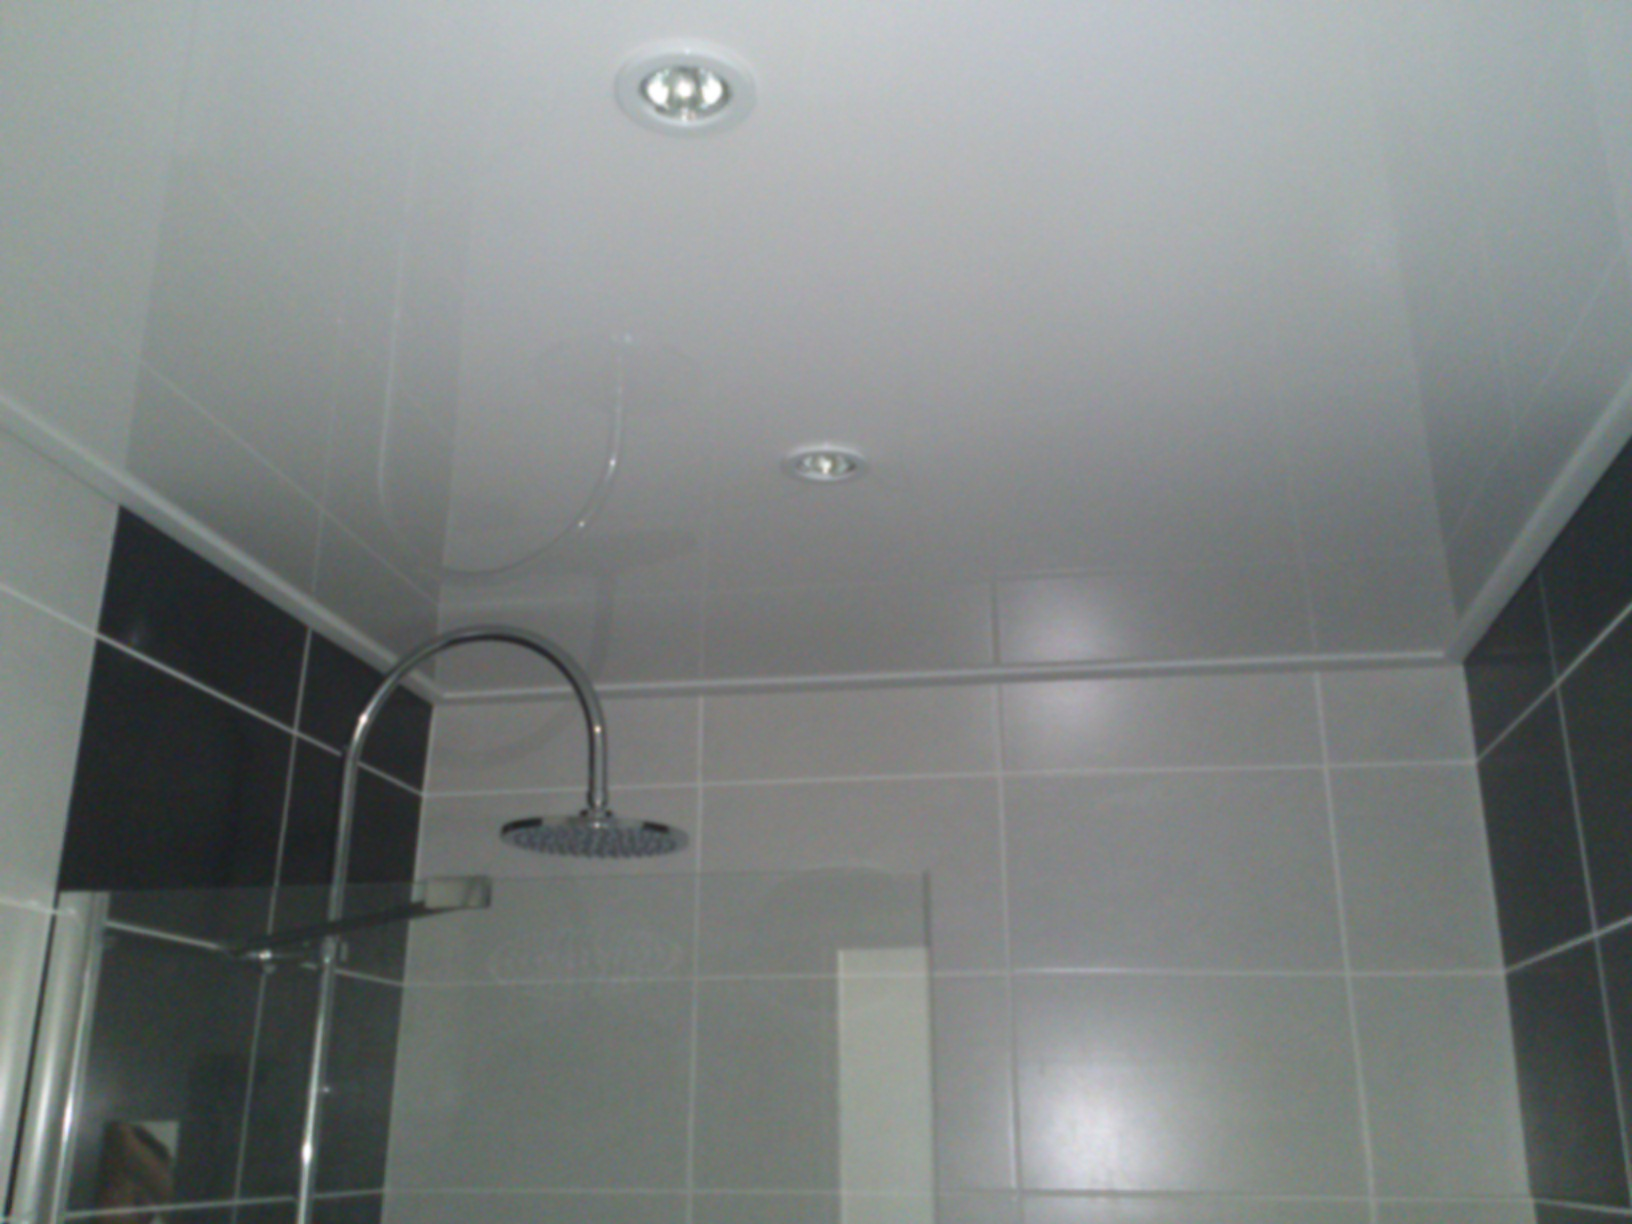 Plafond de salle de bain en pvc isolation id es for Luminaire salle de bain plafond